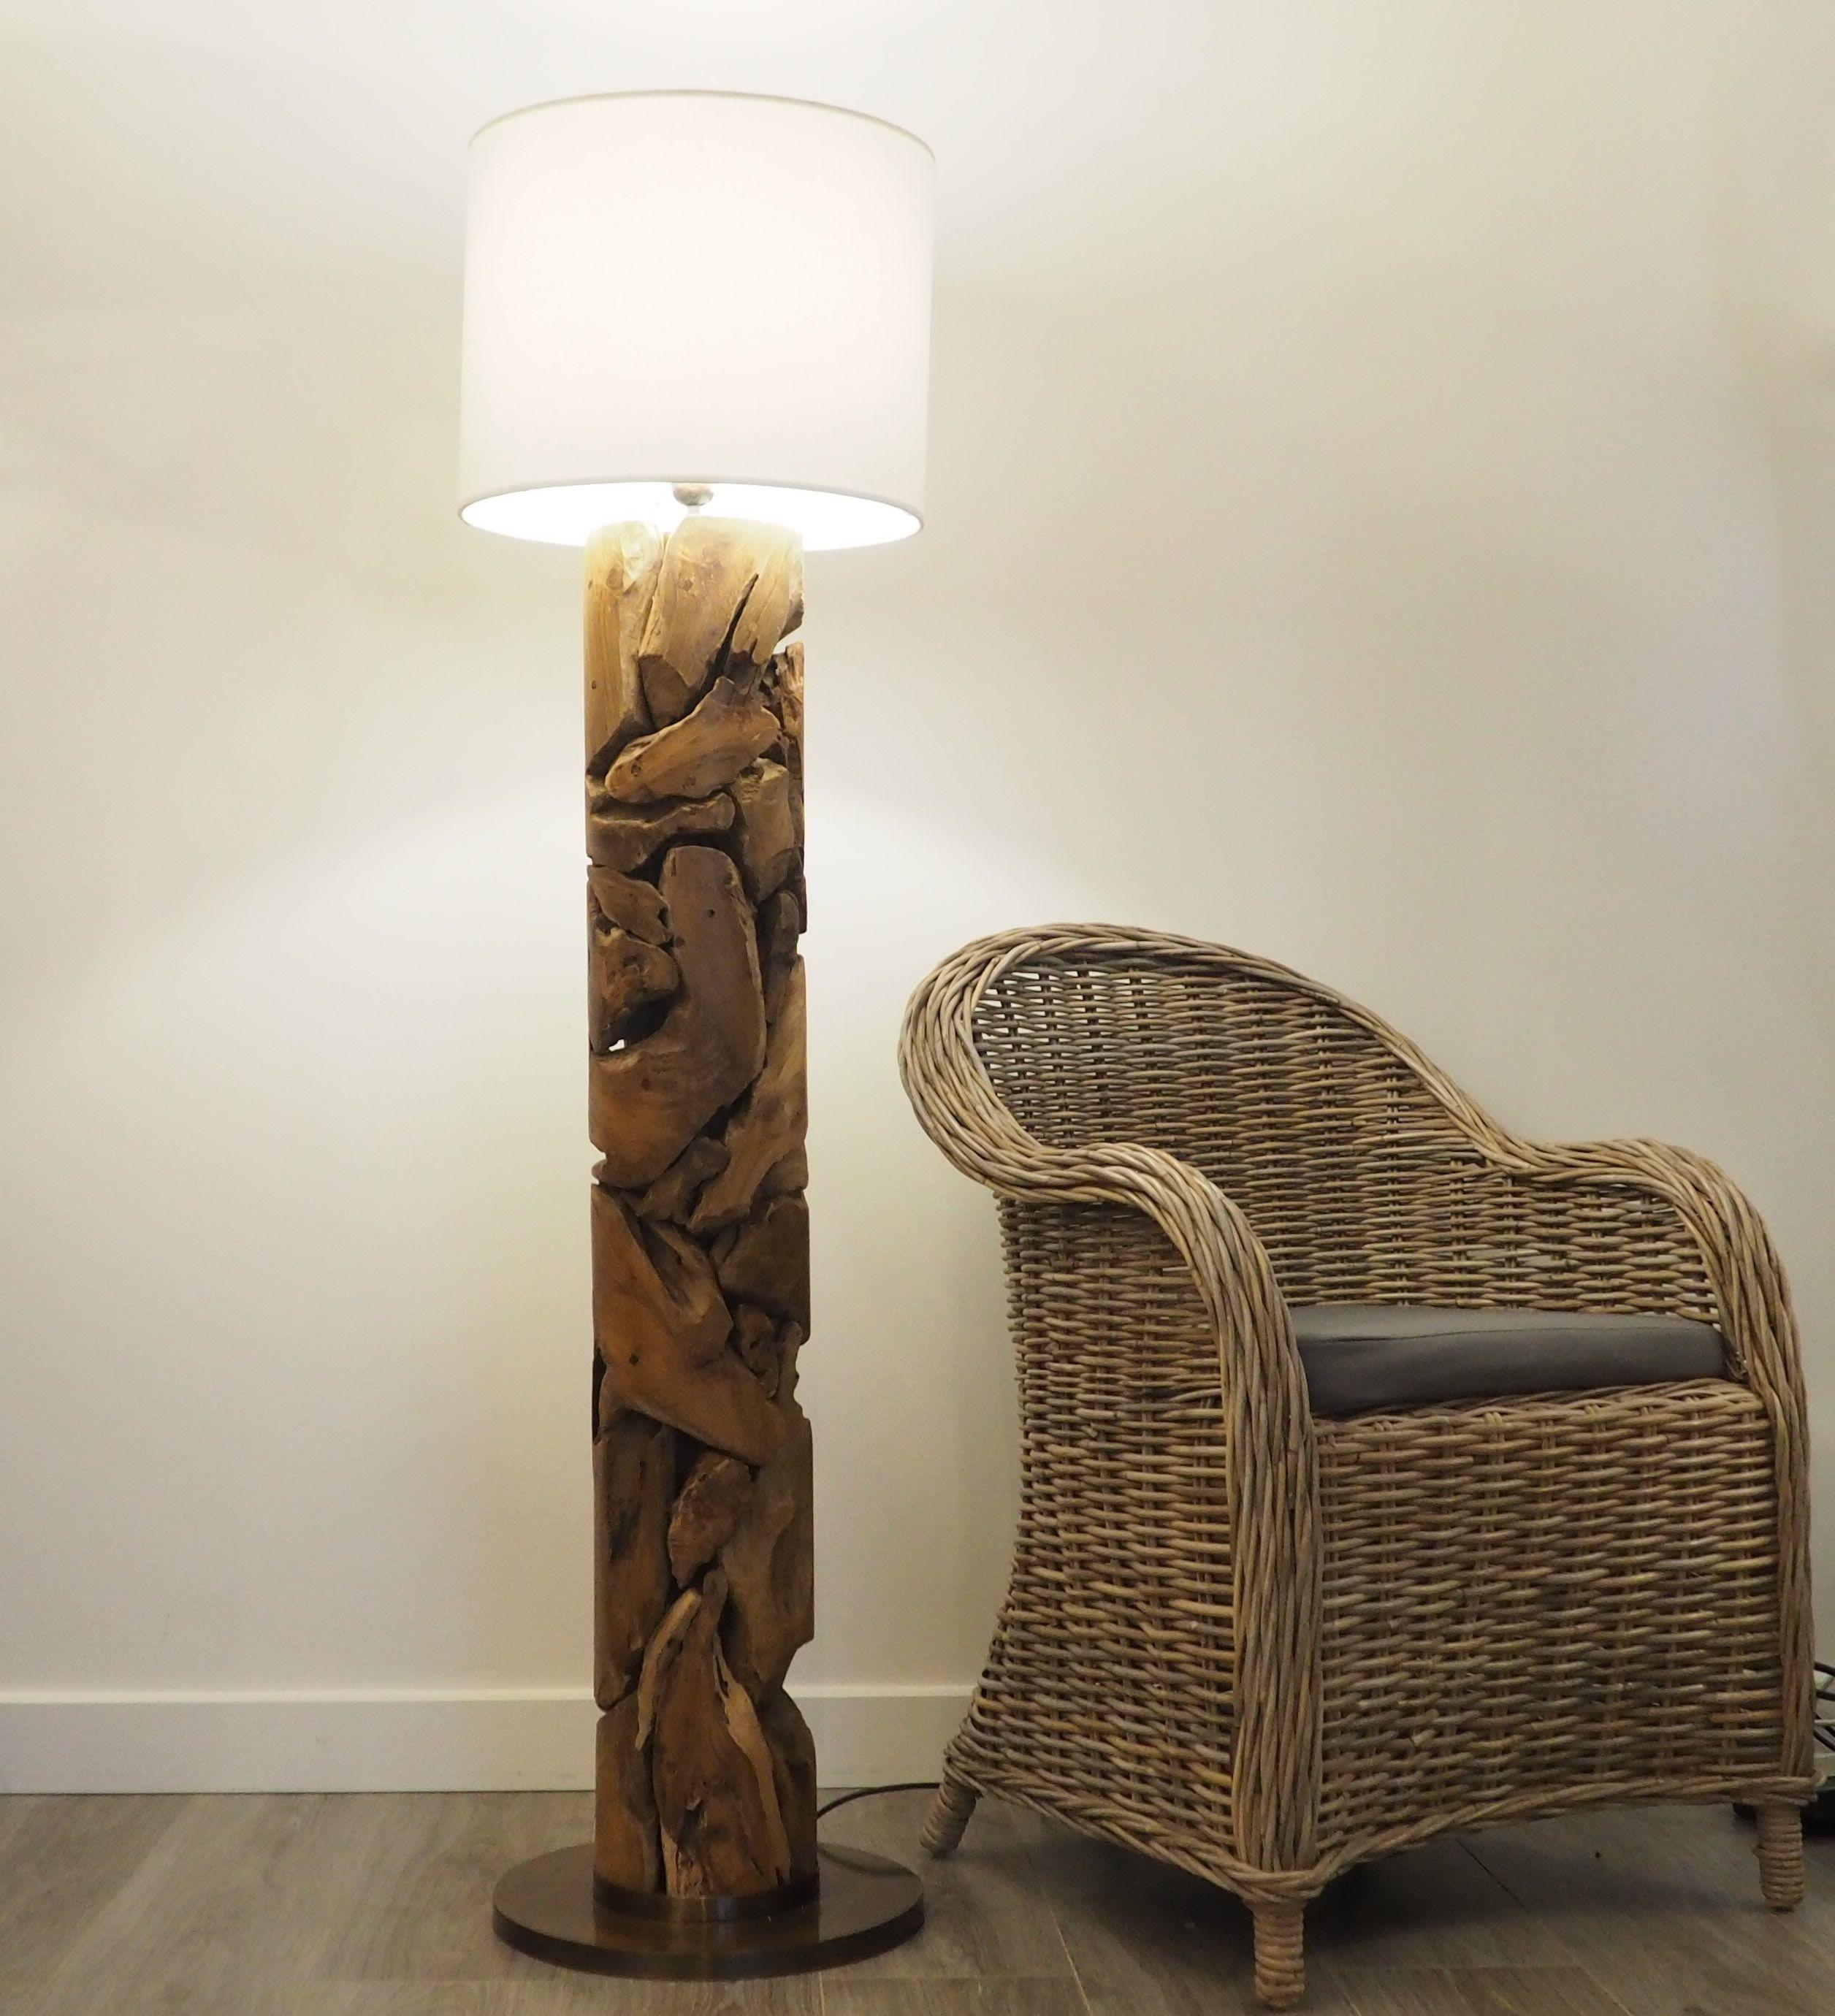 This Impressive Tubular Floor Lamp Medium Is Made Up Of Rustic Teak Wood With Each Piece Of Teak Woven Wood Floor Lamp Rustic Wood Floors Rustic Floor Lamps